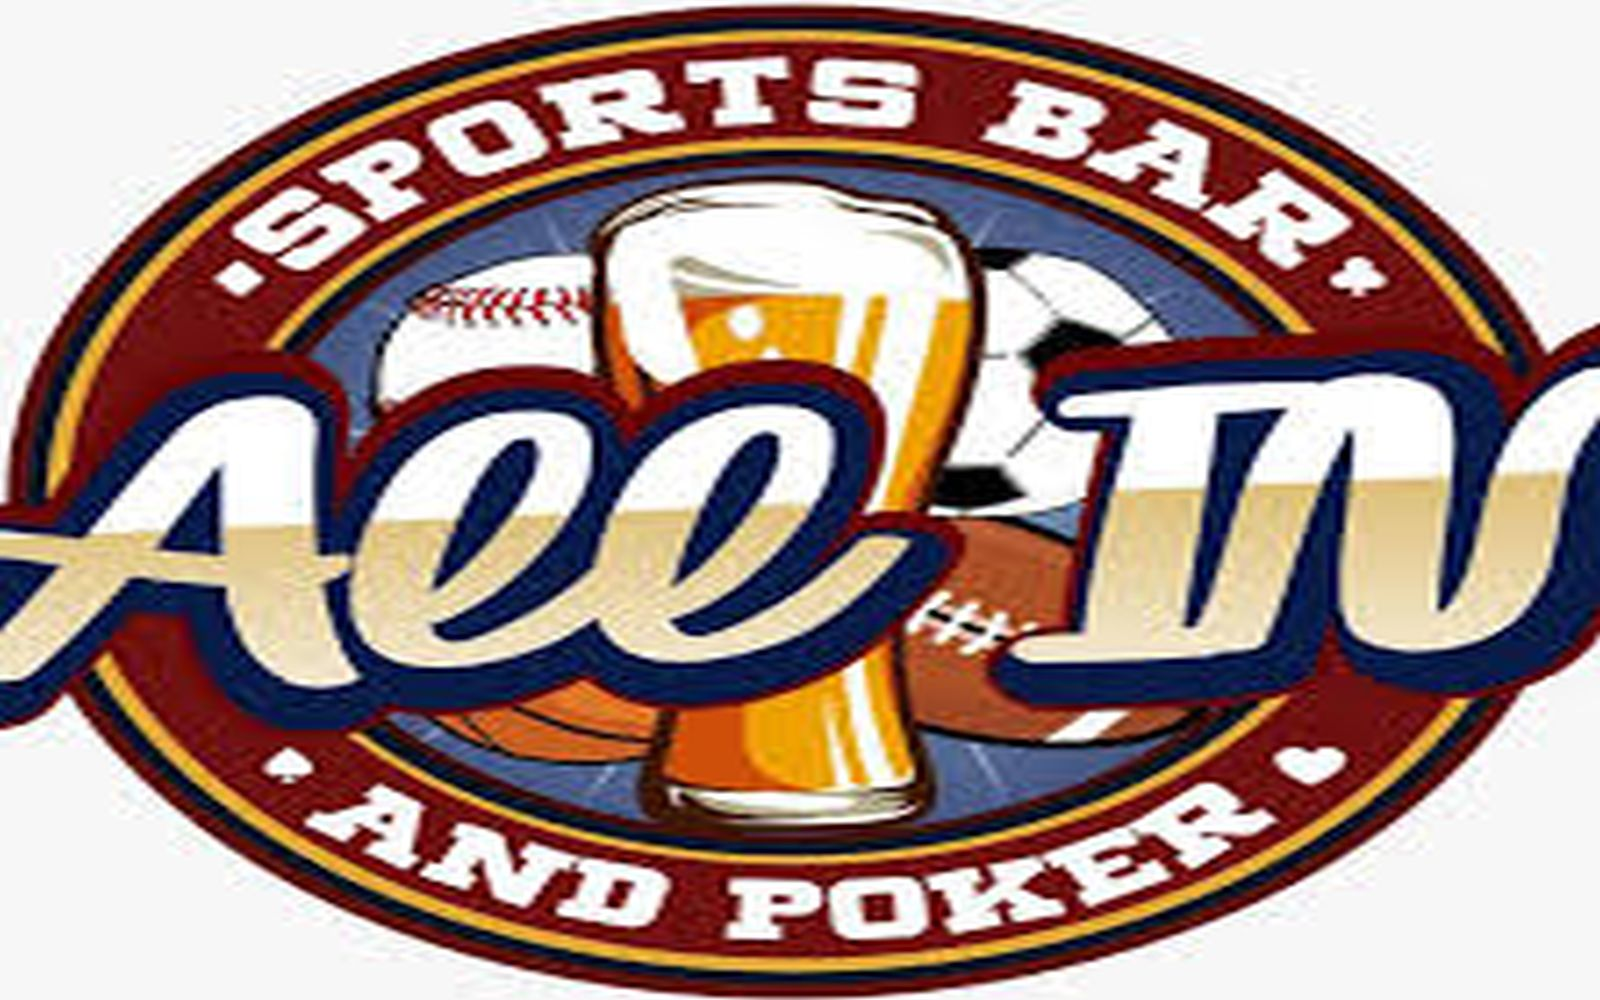 All In Poker Club